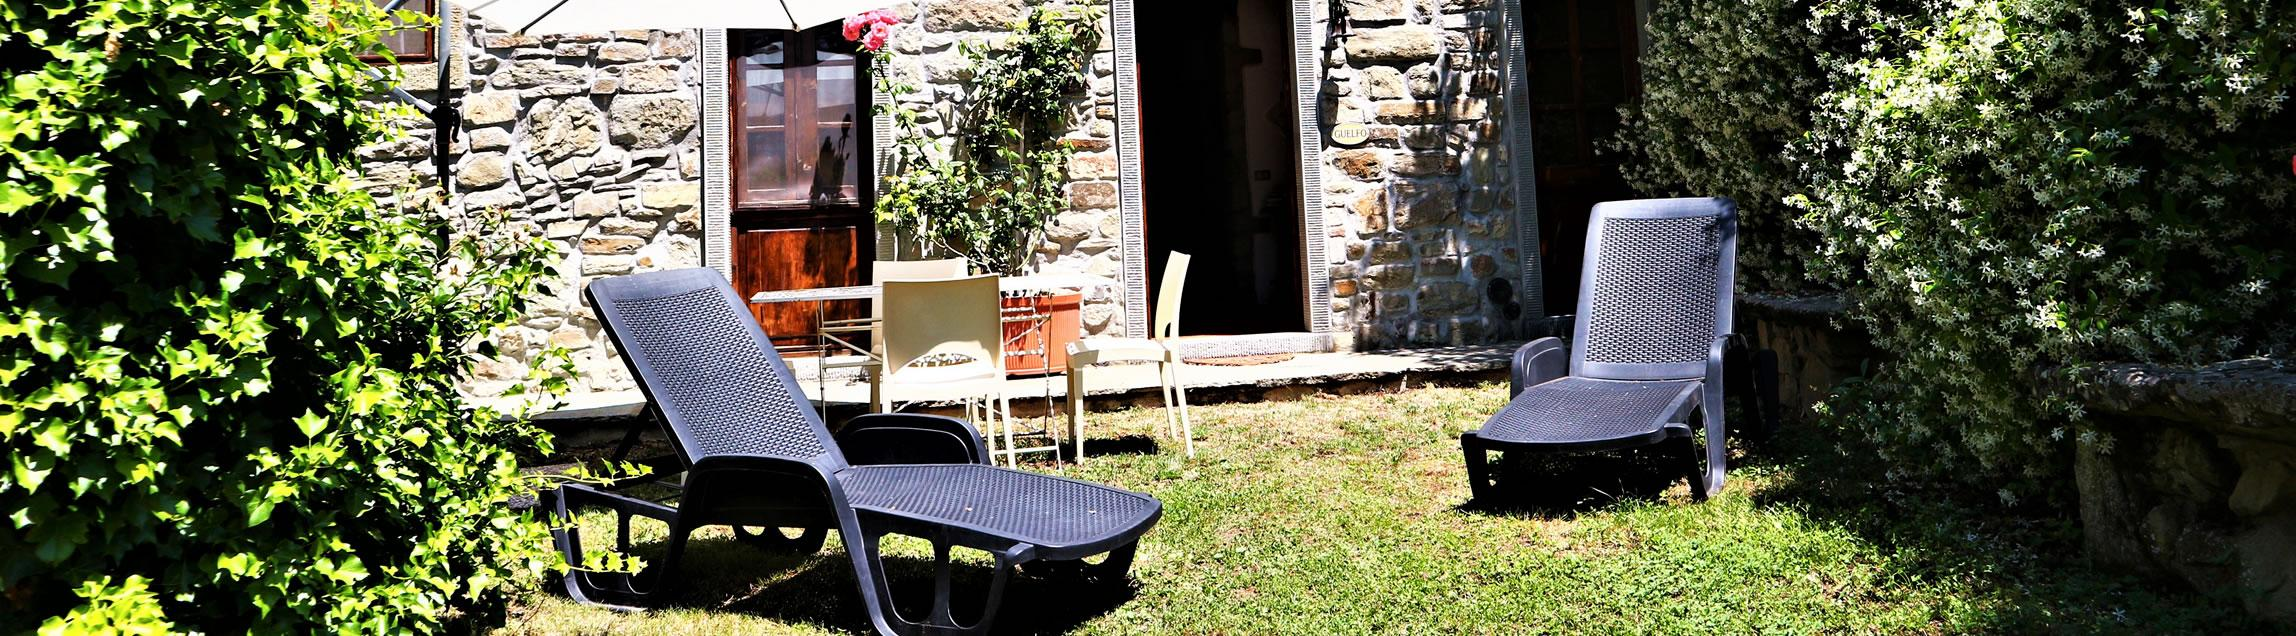 tami_ferienhaus_toskana_slide